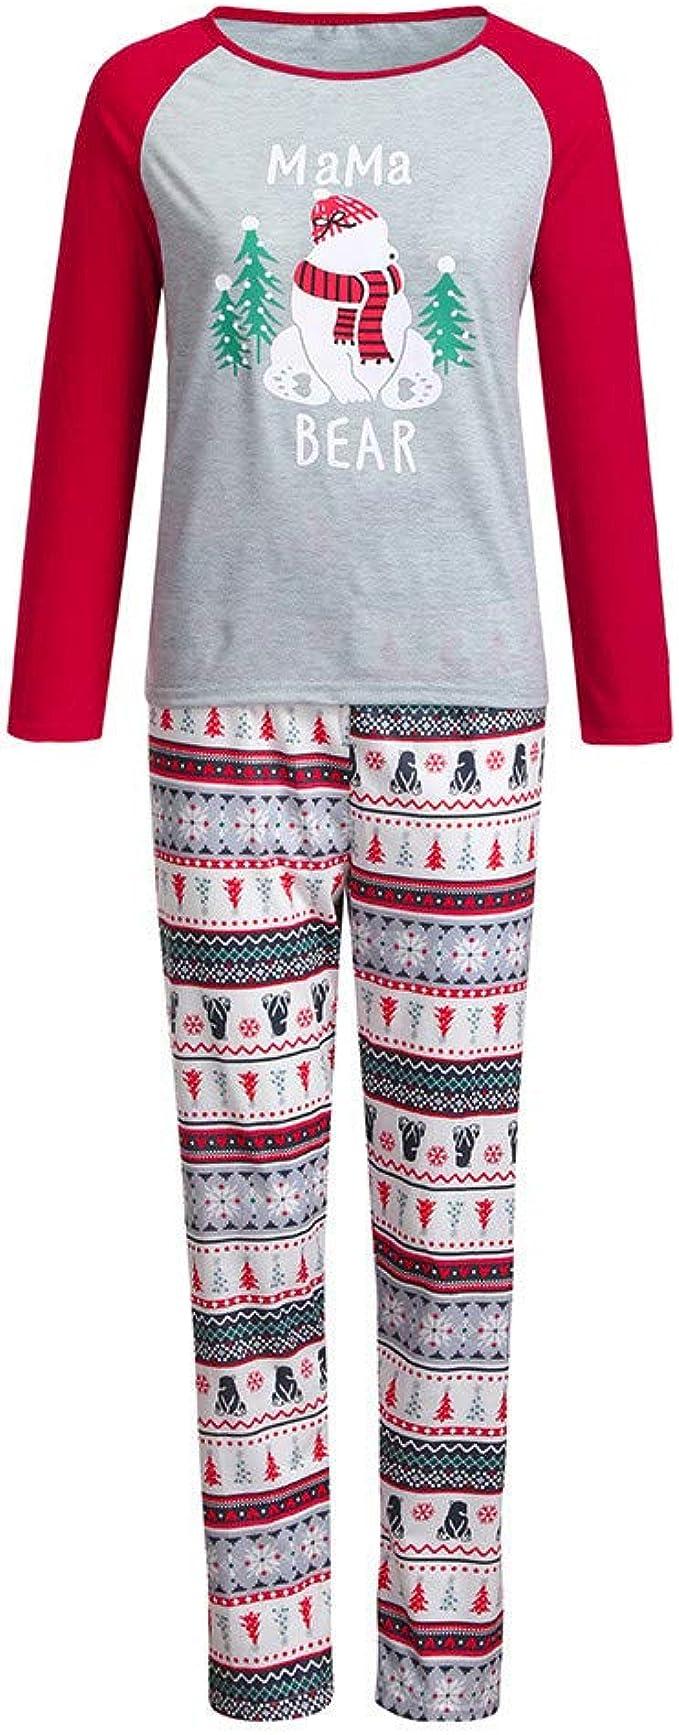 Pijama Navidad Familiar Carta Blusa Pantalones Familia ...